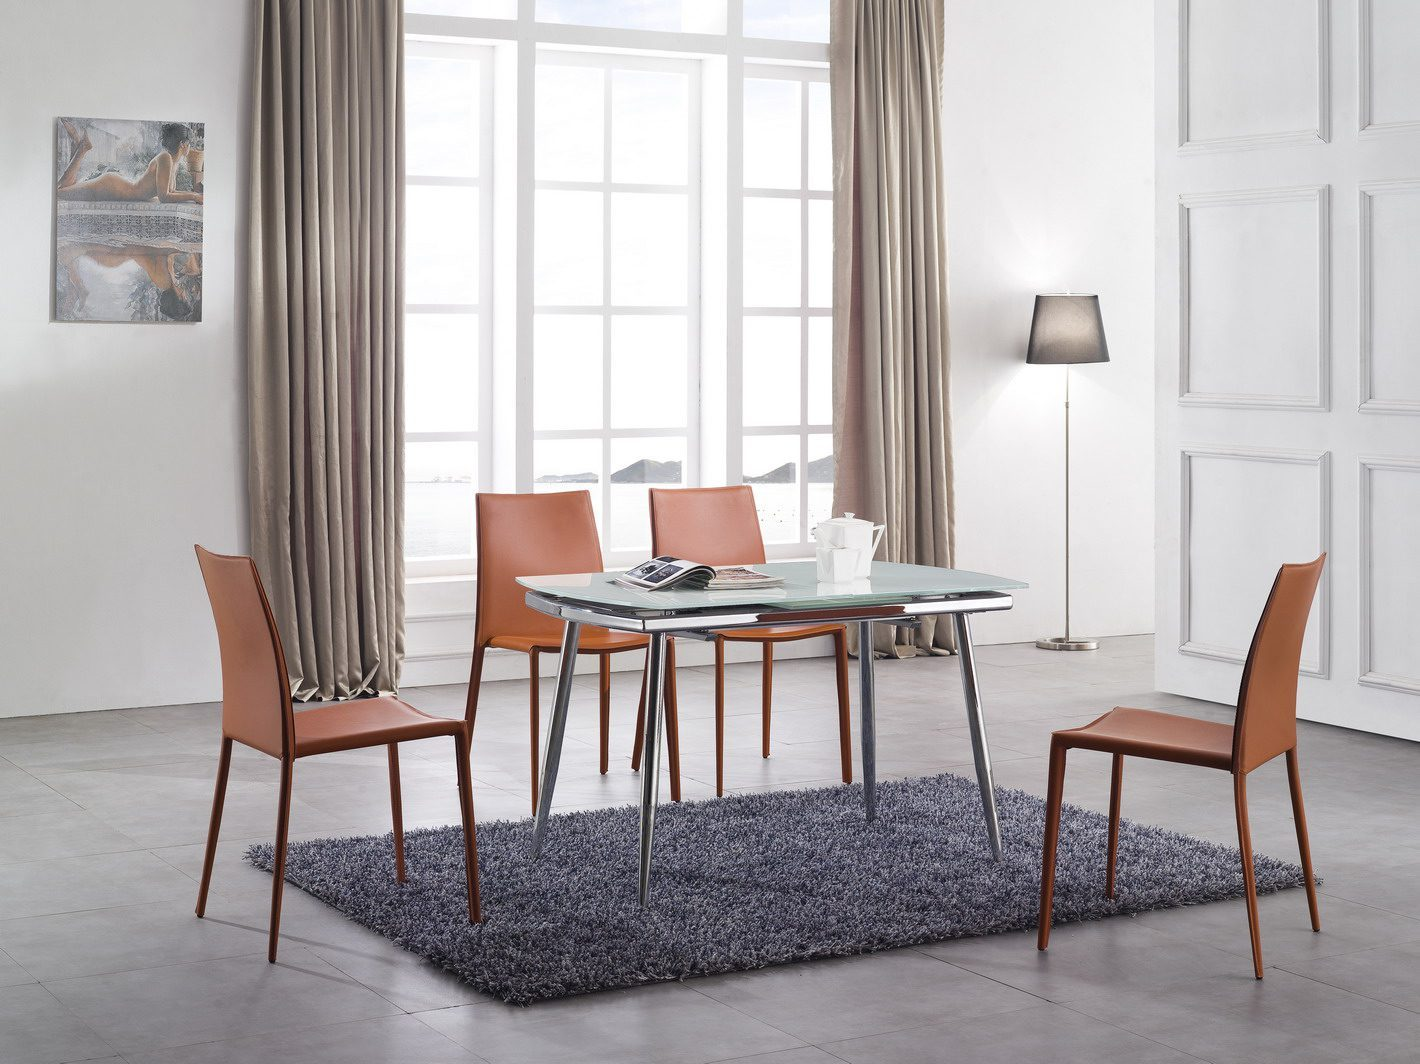 Стол ESF LT6230 белый, стул ESF 3018 оранжевый